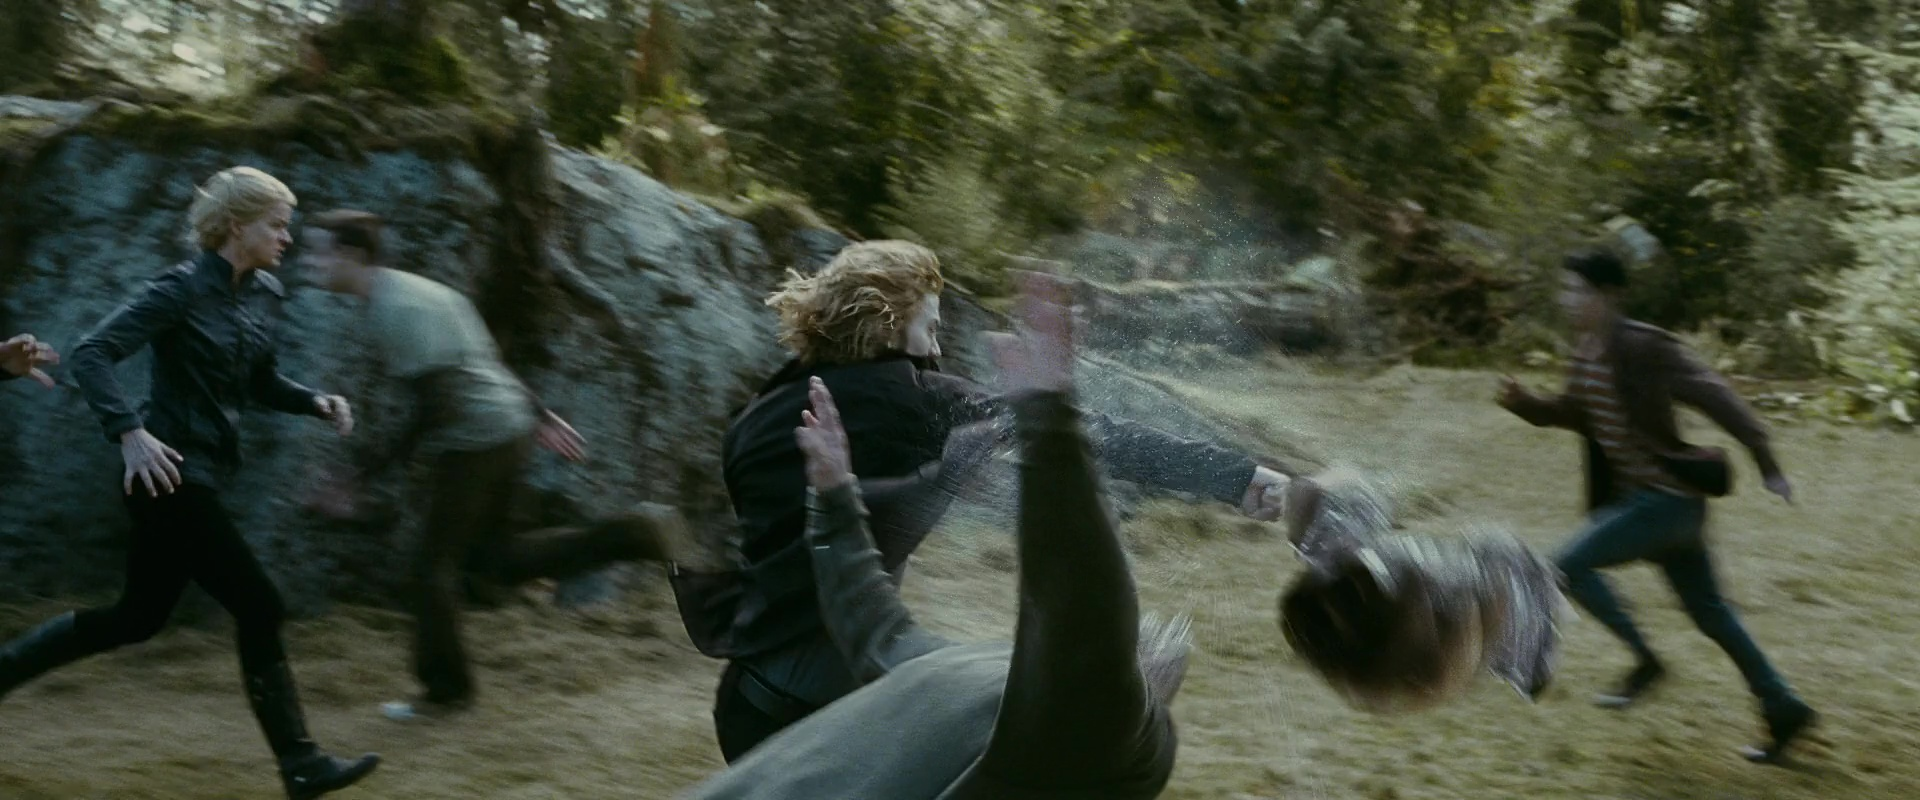 File:Jasper knocks someones head off.jpg